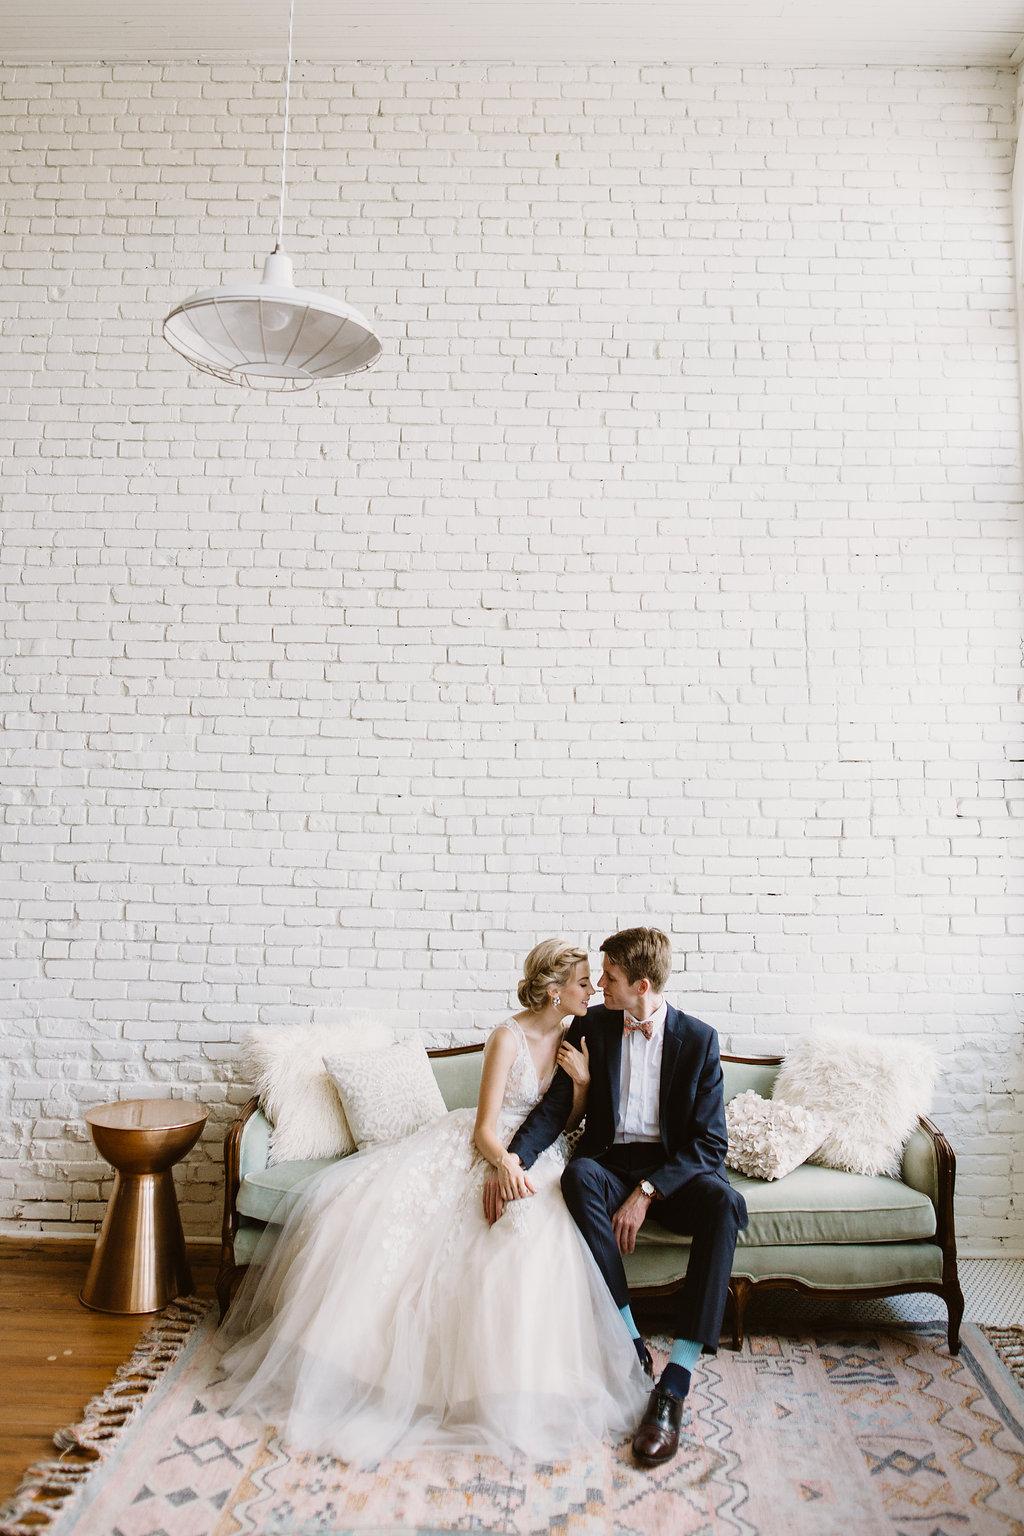 One-Eleven-East-Blog-Katie-Collin-Wedding-Ideas.jpg